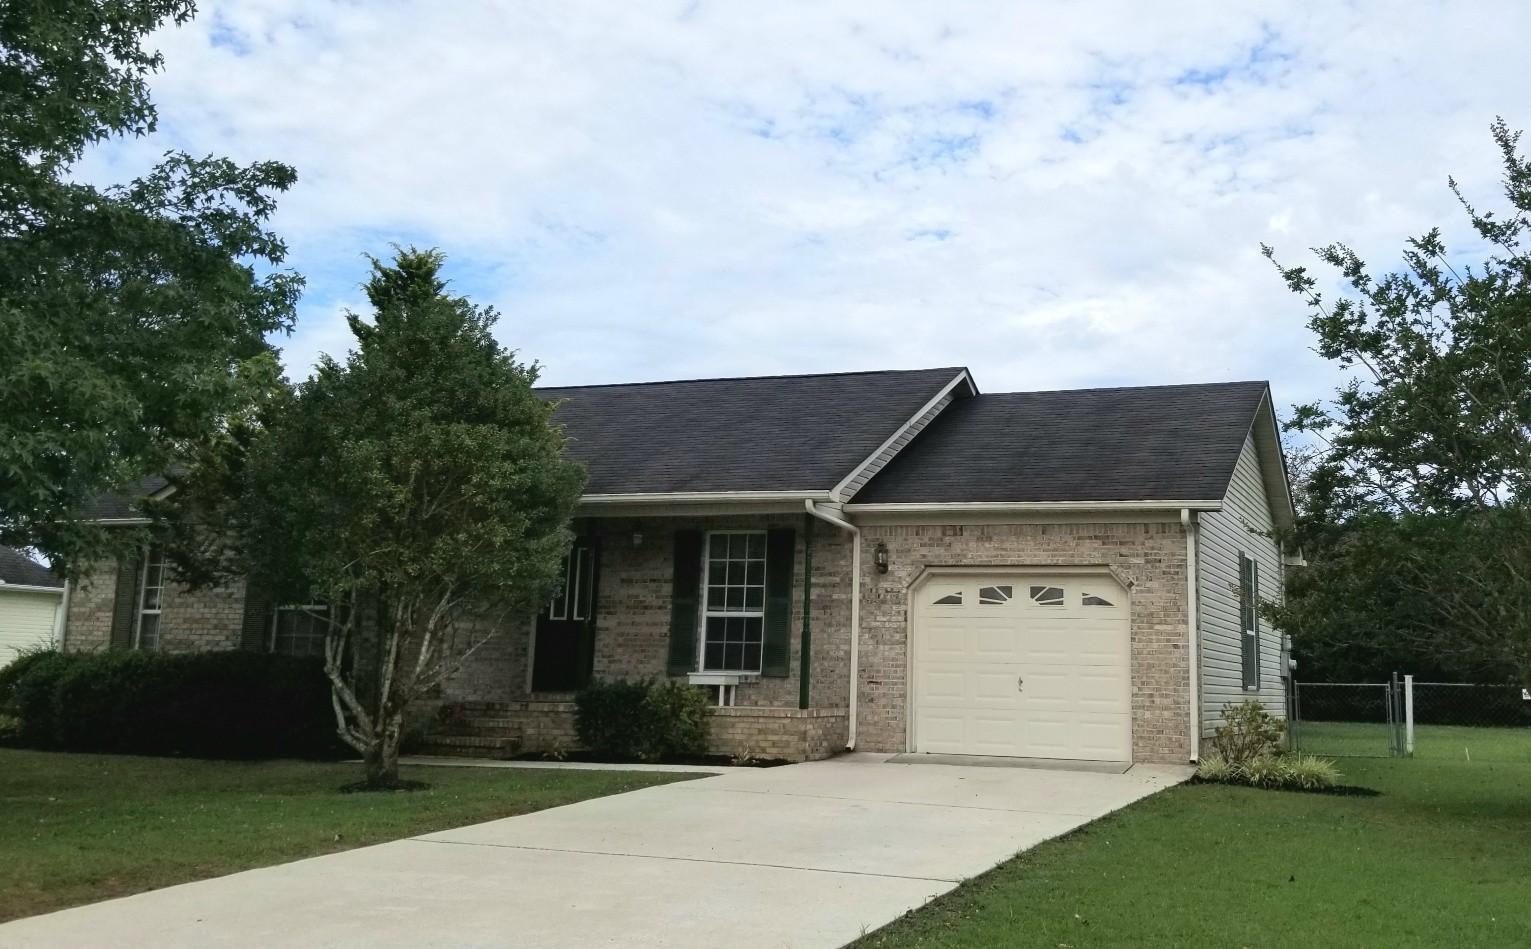 309 Steeplechase Dr Property Photo - Smithville, TN real estate listing